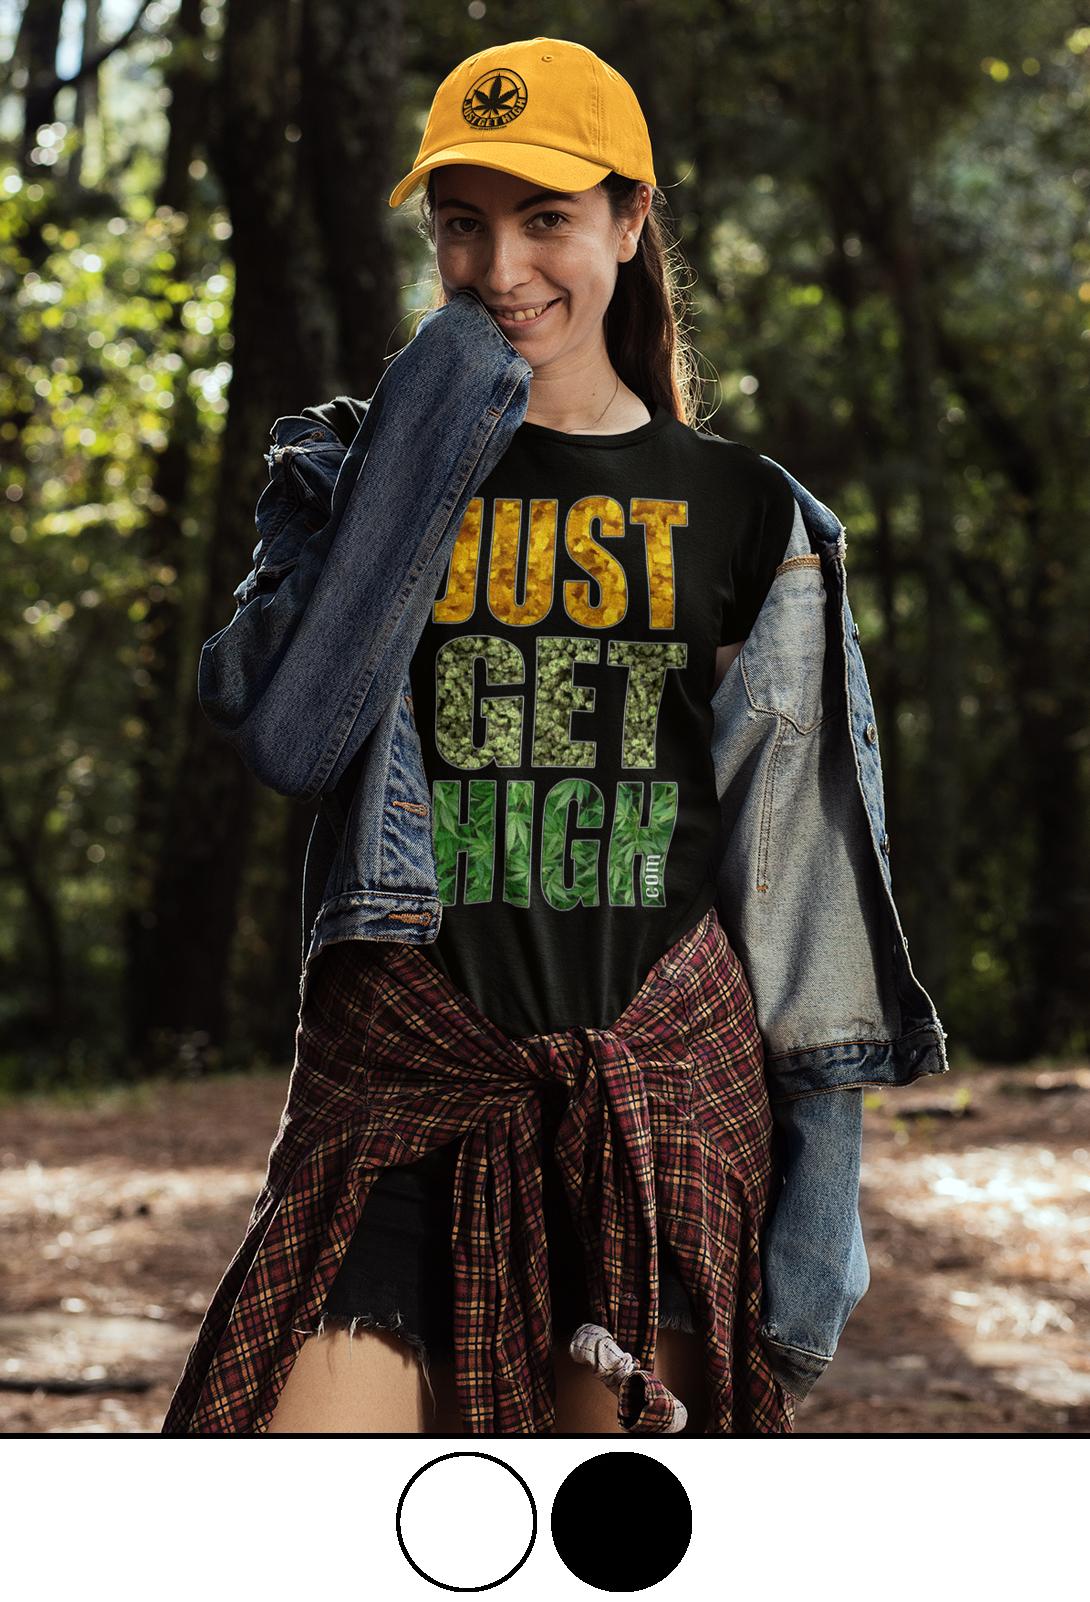 dab nug leaf_just get high_model